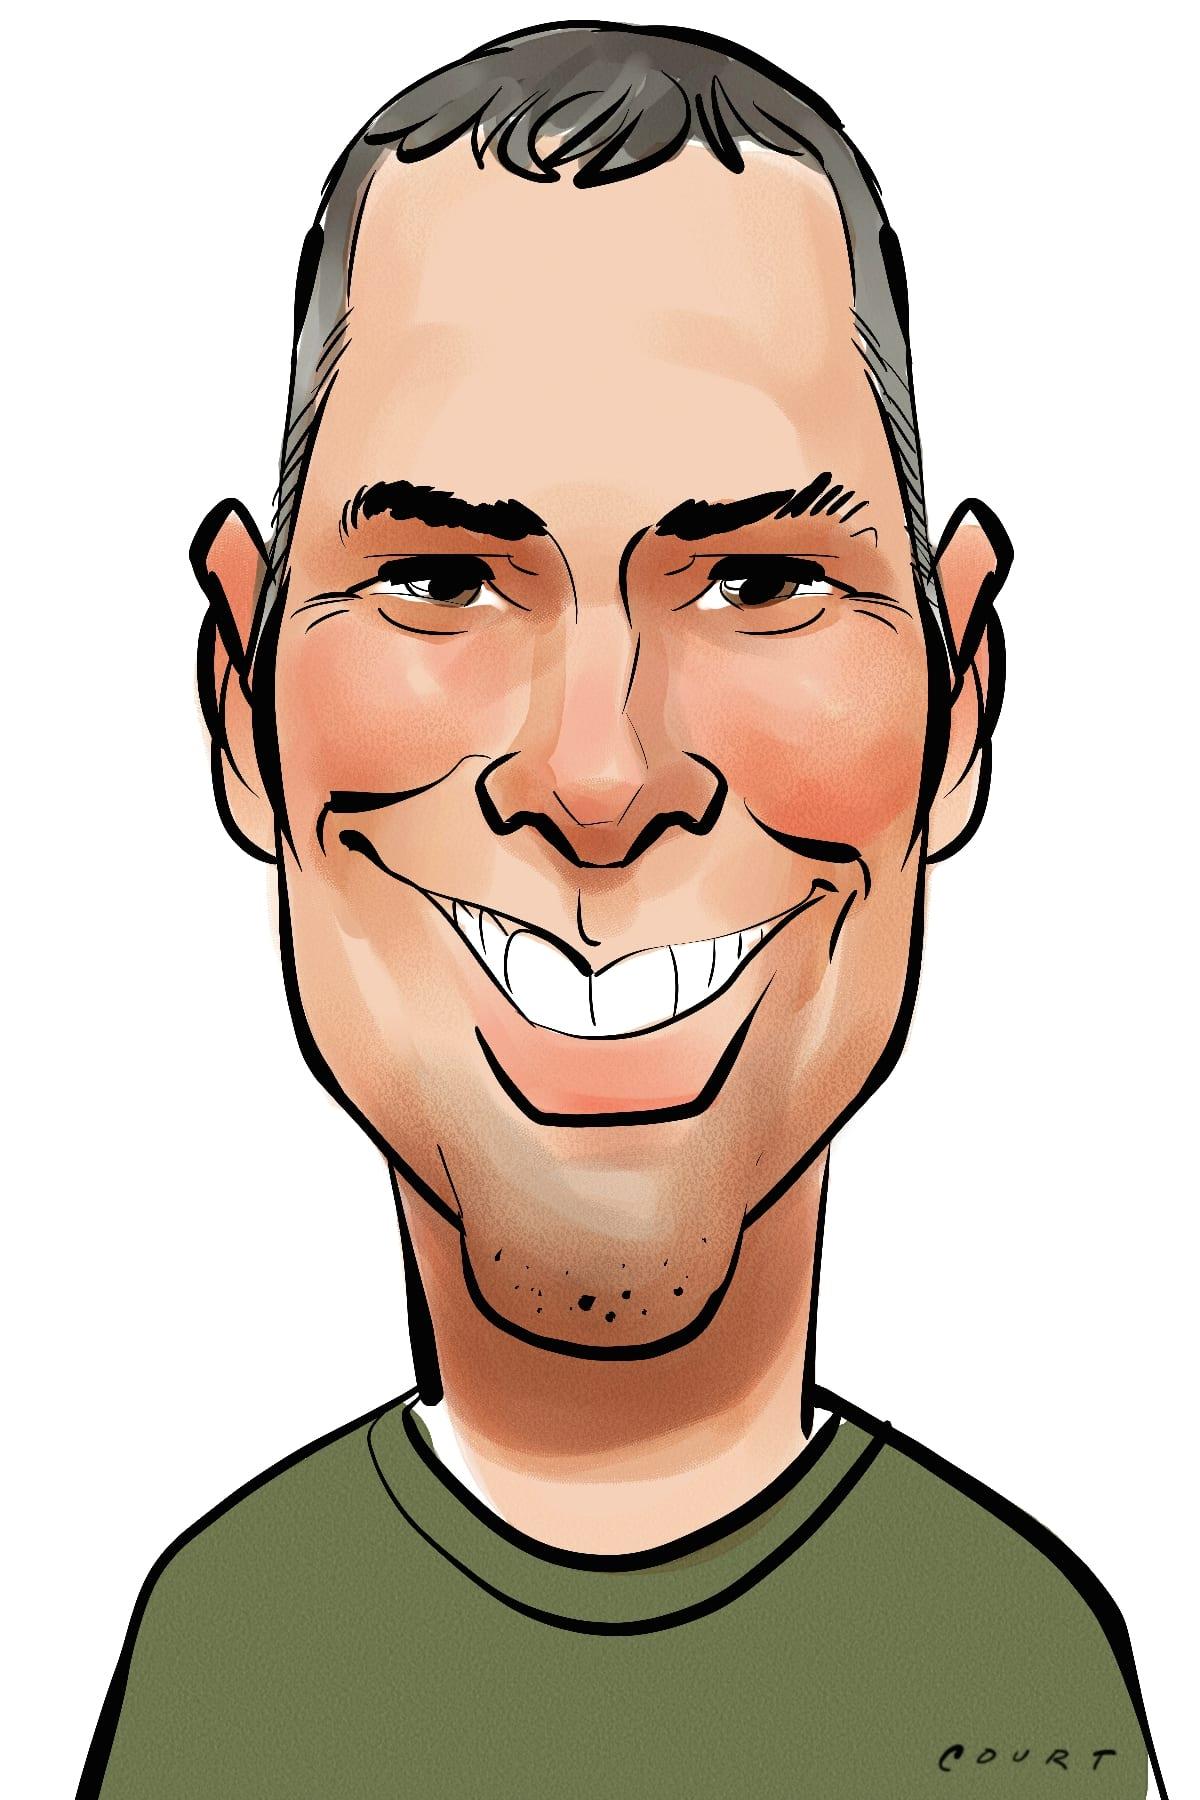 Employee Spotlight: Scott Glerum, Senior Systems Engineer